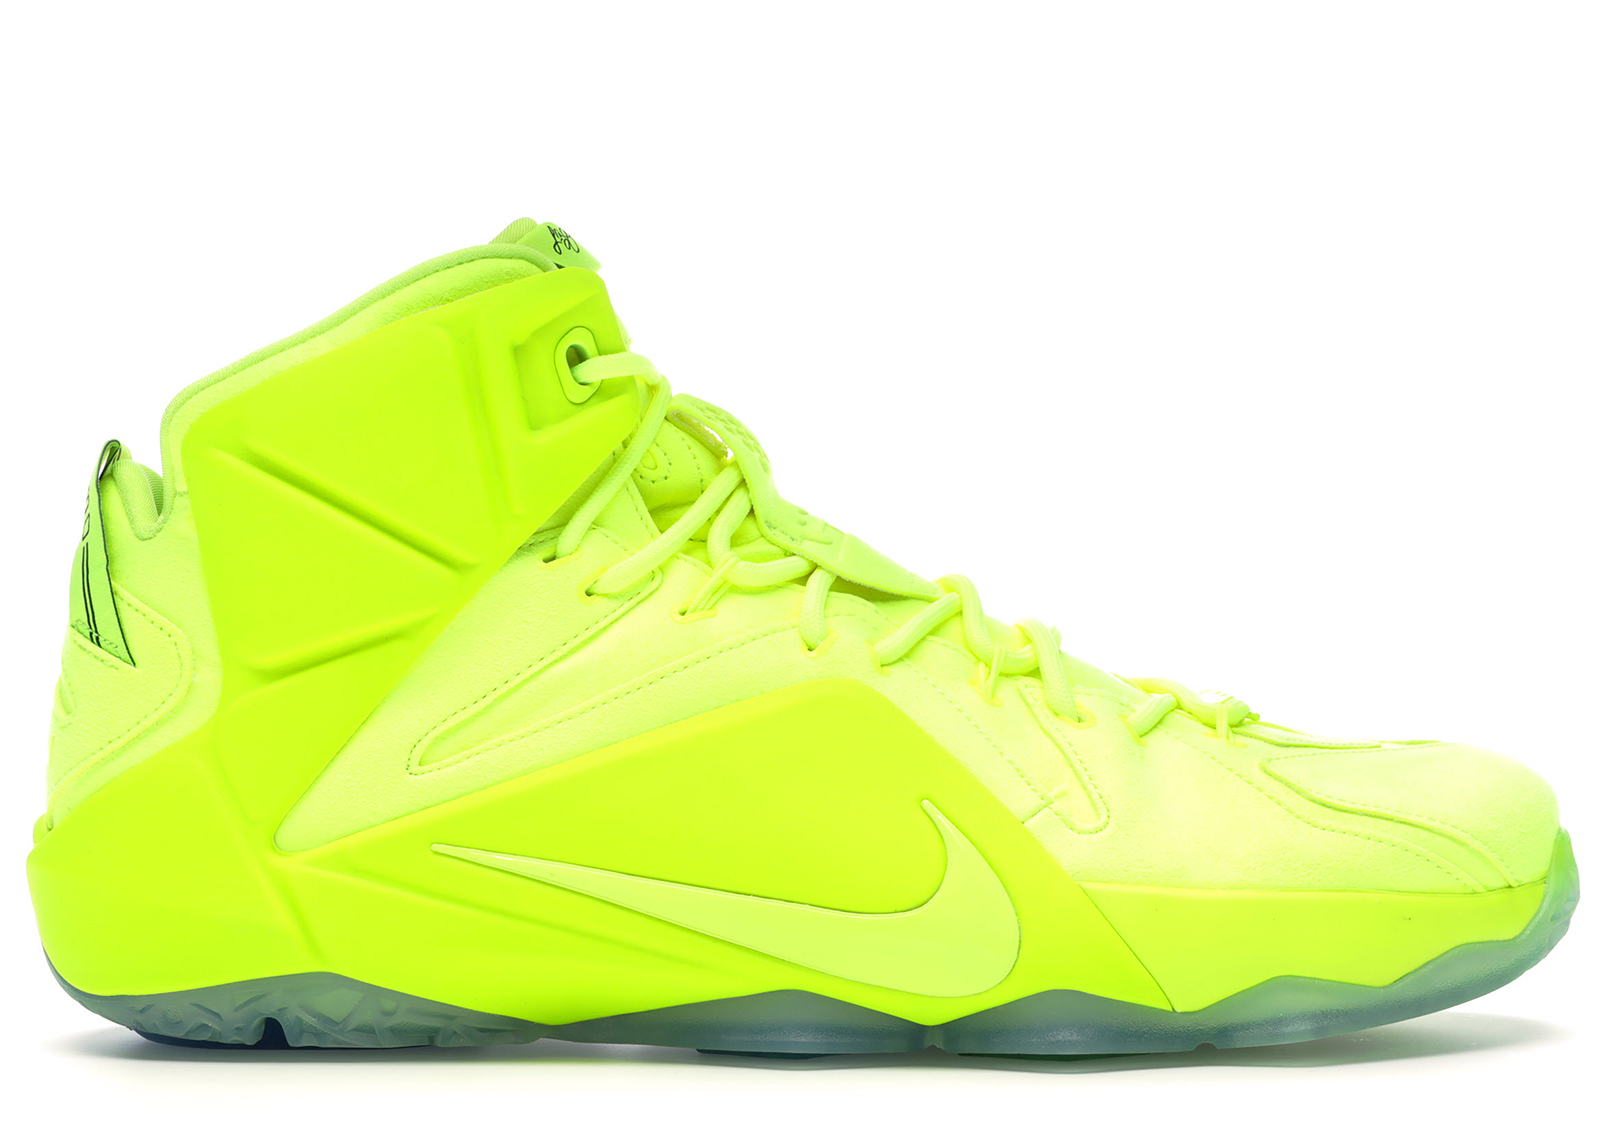 Nike LeBron XII EXT Cork | Nike lebron, Nike, Basketball shoes